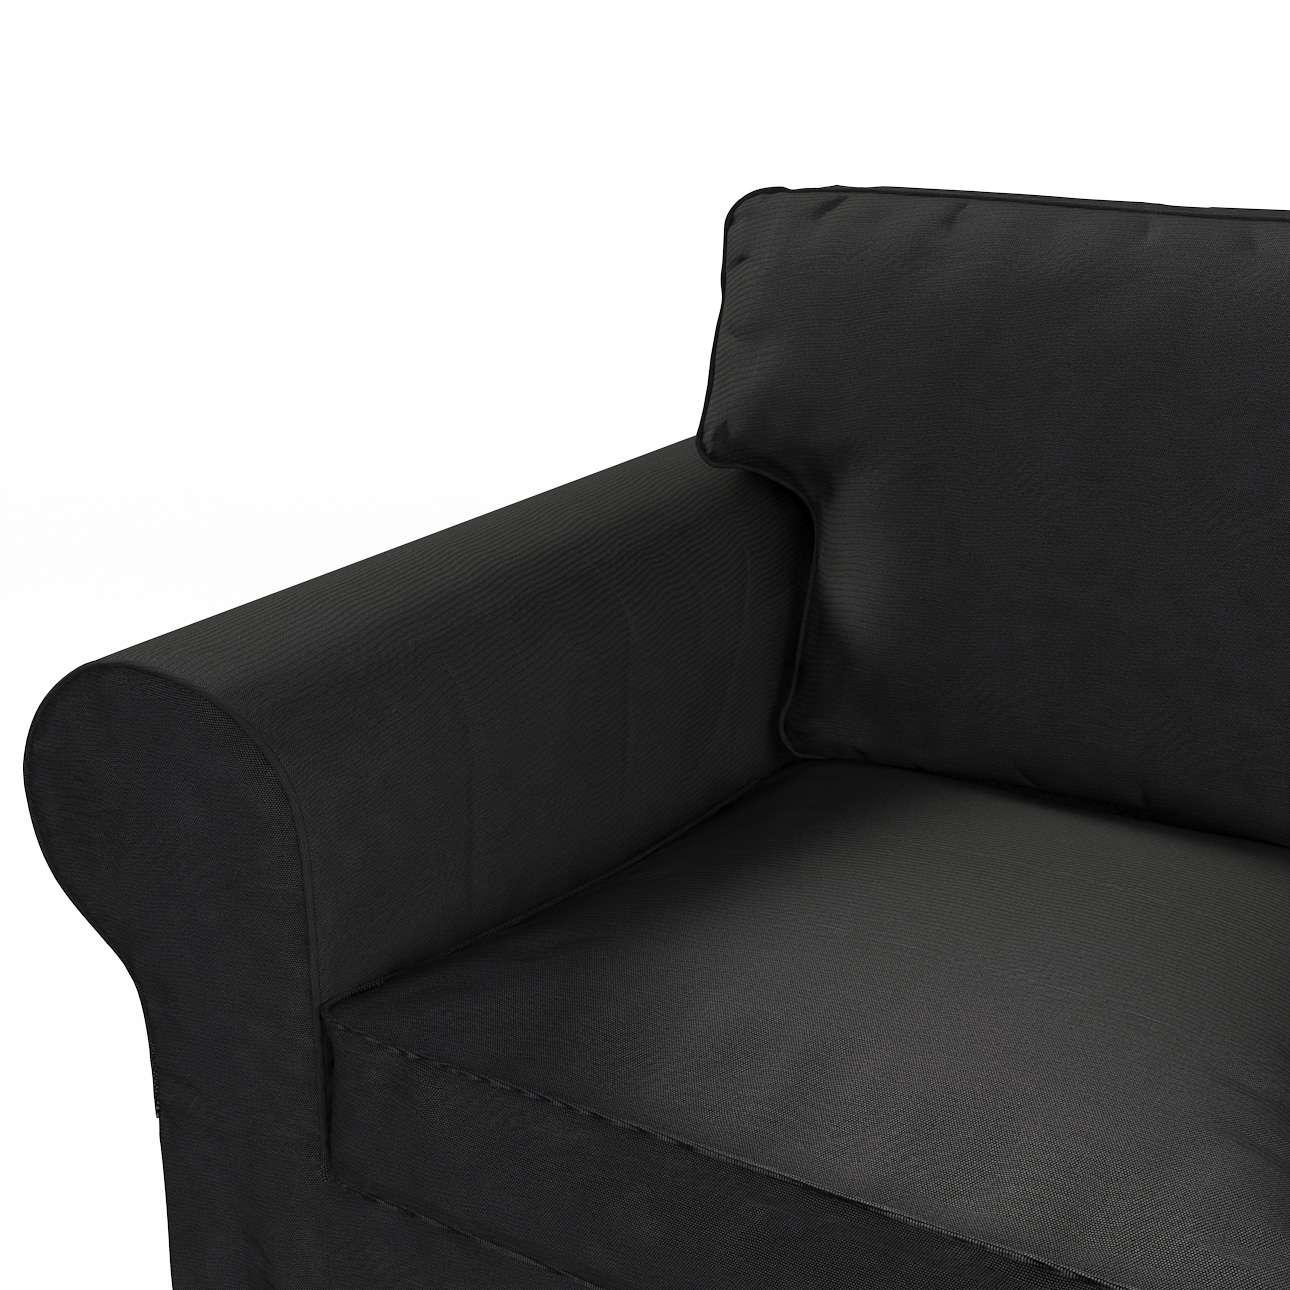 Ektorp 3-Sitzer Schlafsofabezug, ALTES Modell Sofahusse Ektorp 3-Sitzer Schlafsofa von der Kollektion Etna, Stoff: 705-00